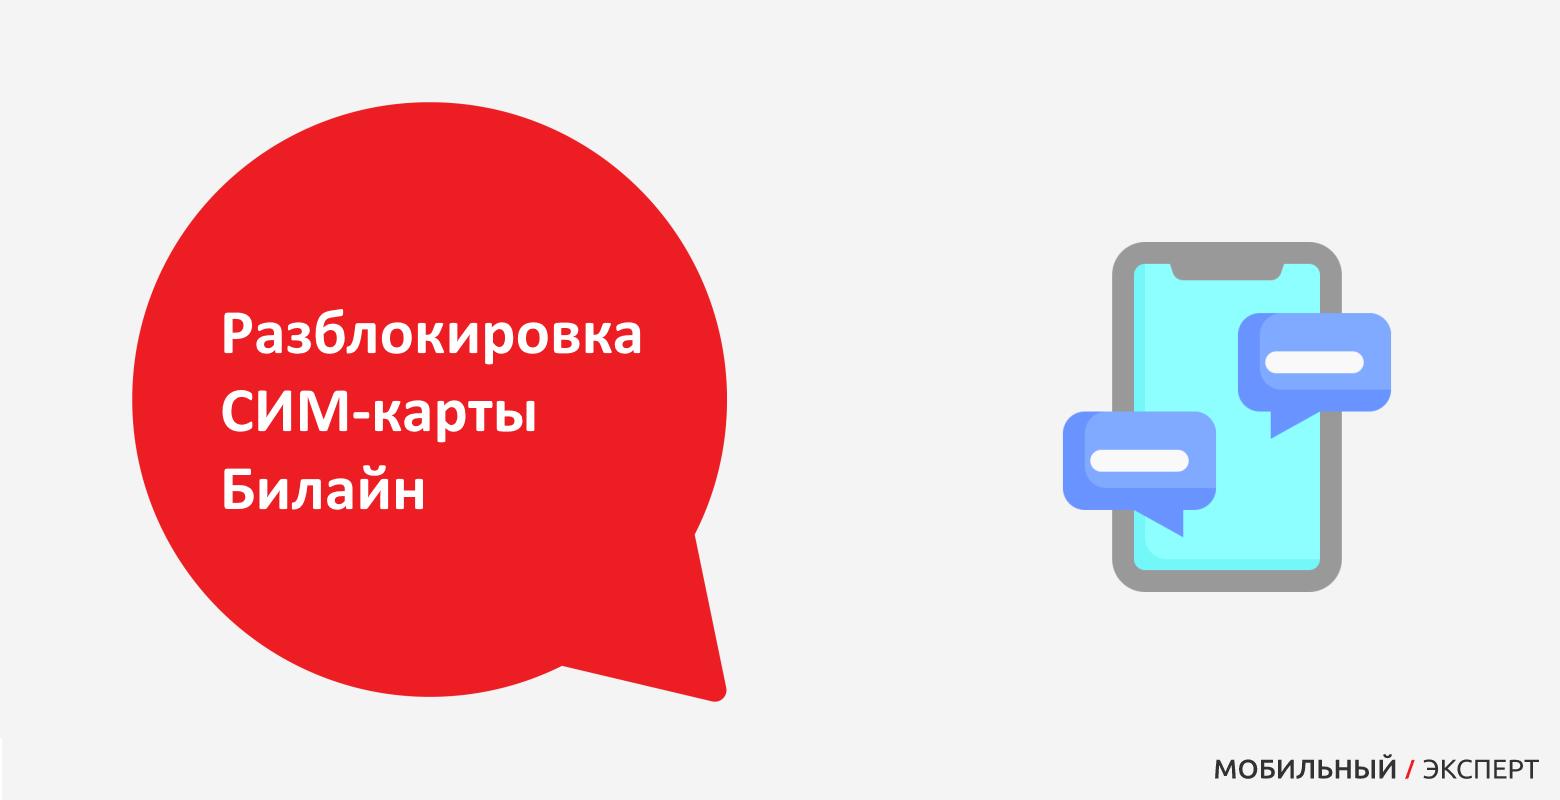 Разблокировка СИМ-карты Билайн